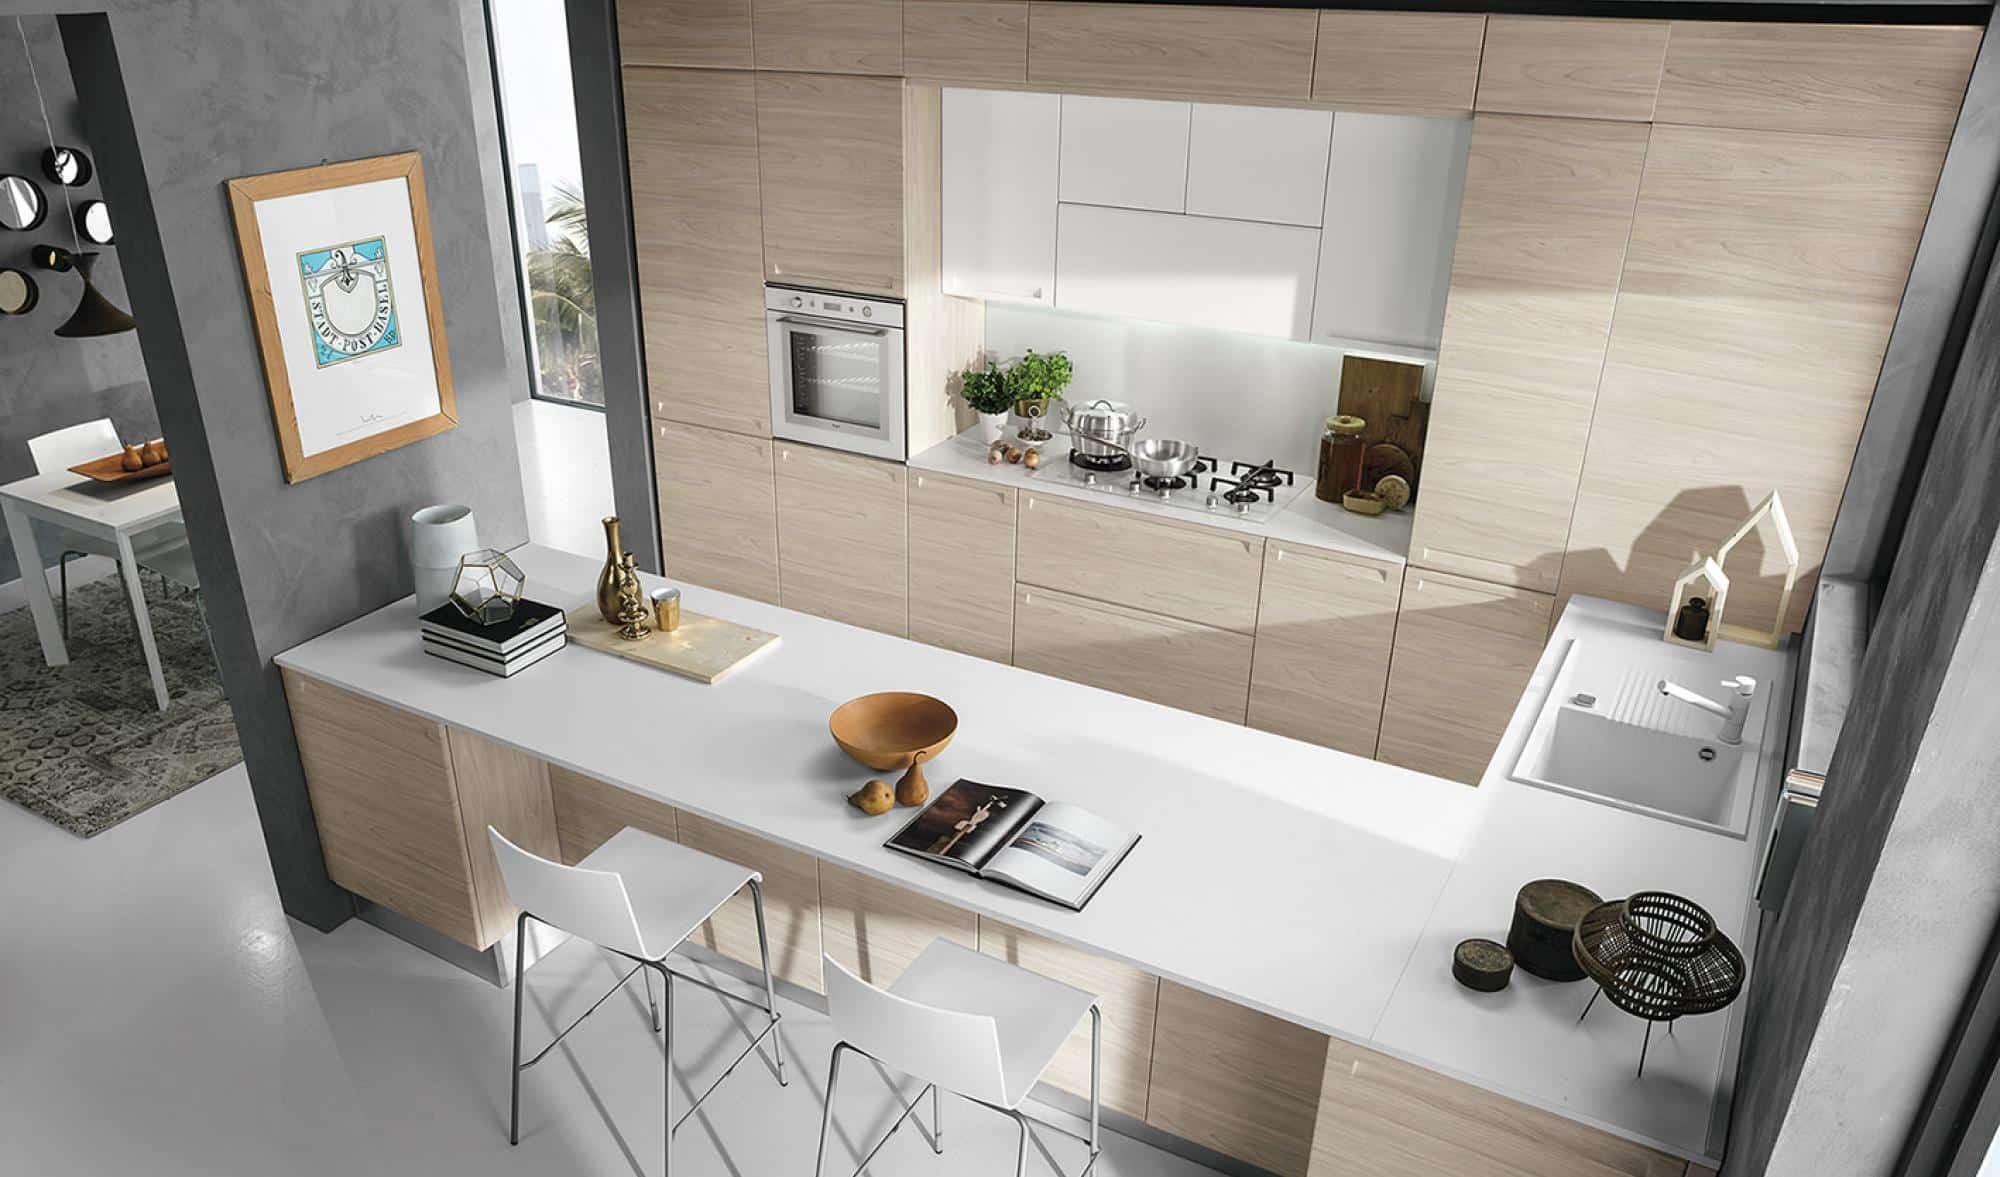 Isla κουζινα σε φυσικο χρωματισμο με λευκο πολυμερικο με ενσωματωμενη λαβη και ρετρο υφος λεπτομερειες